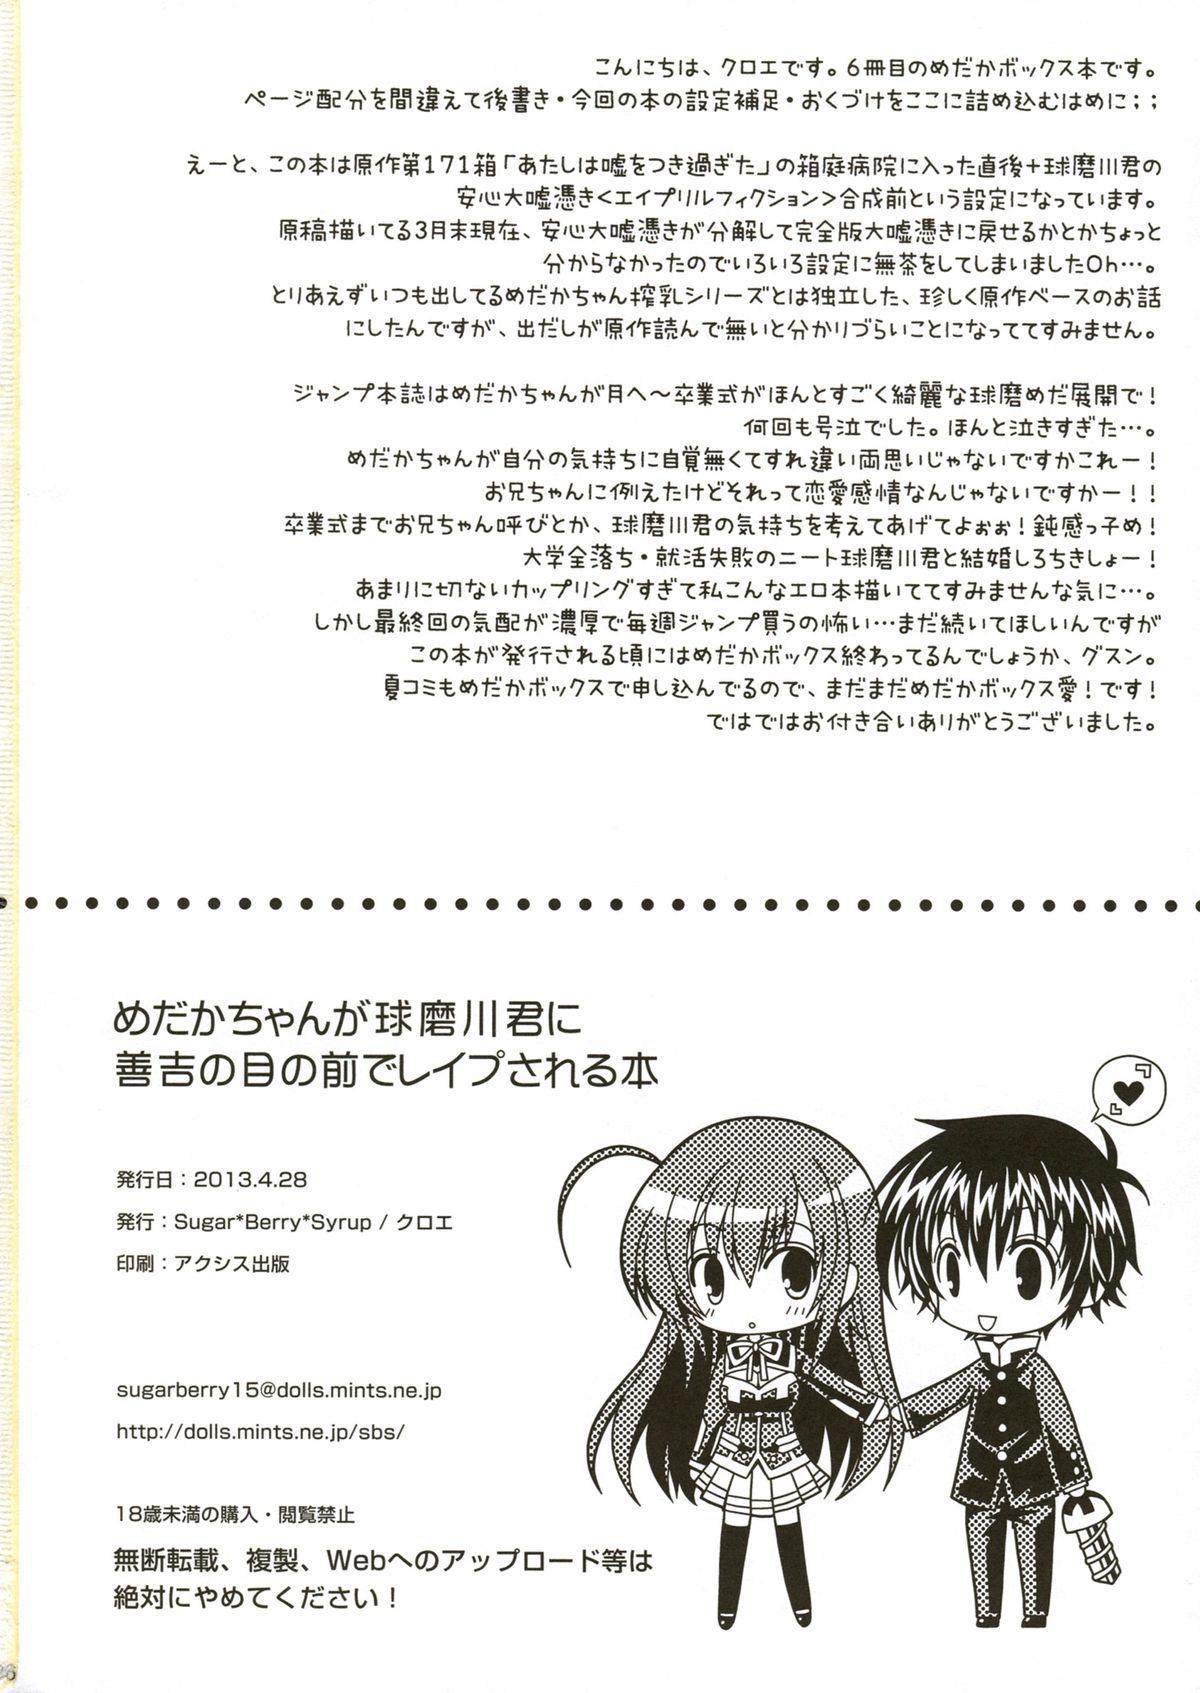 (COMIC1☆7) [Sugar*Berry*Syrup (Kuroe)] Medaka-chan ga Kumagawa-kun ni Zenkichi no Me no Mae de Rape Sareru Hon | Medaka-chan gets R_ped by Kumagawa-kun in Front of Zenkichi (Medaka Box) [English] {doujin-moe.us} 24